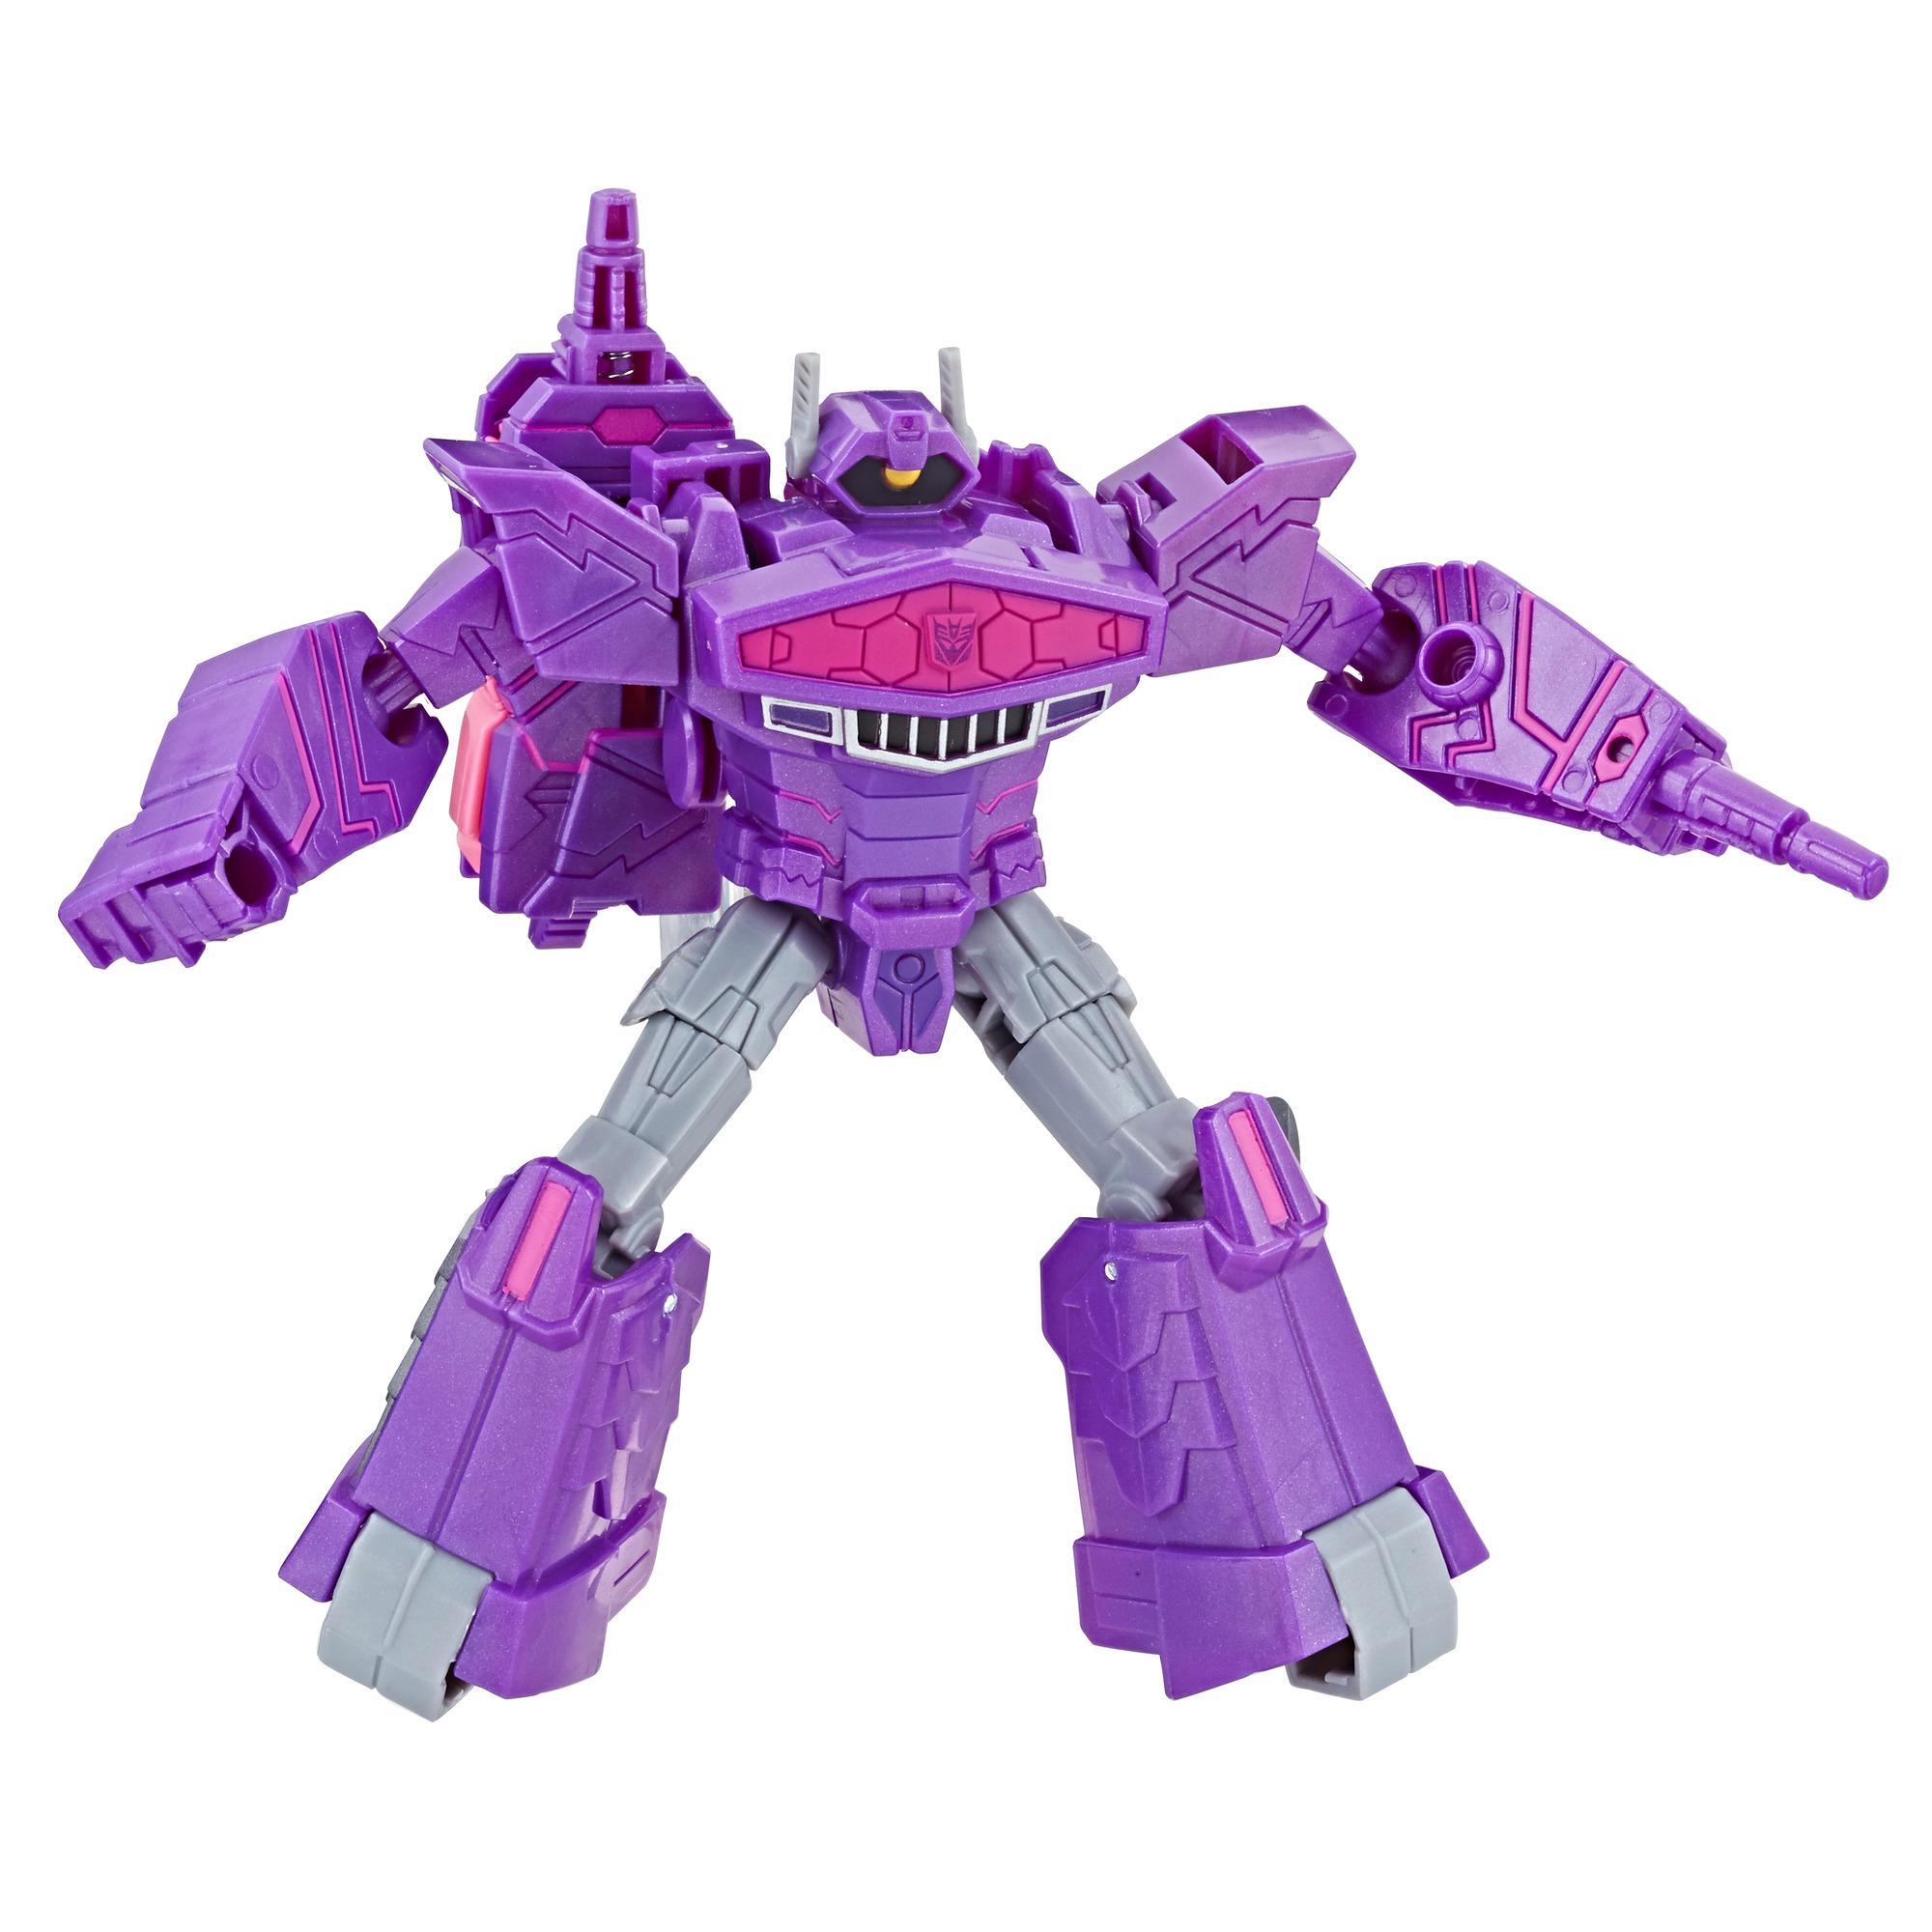 Transformers Cyberverse classe warrior Decepticon Shockwave